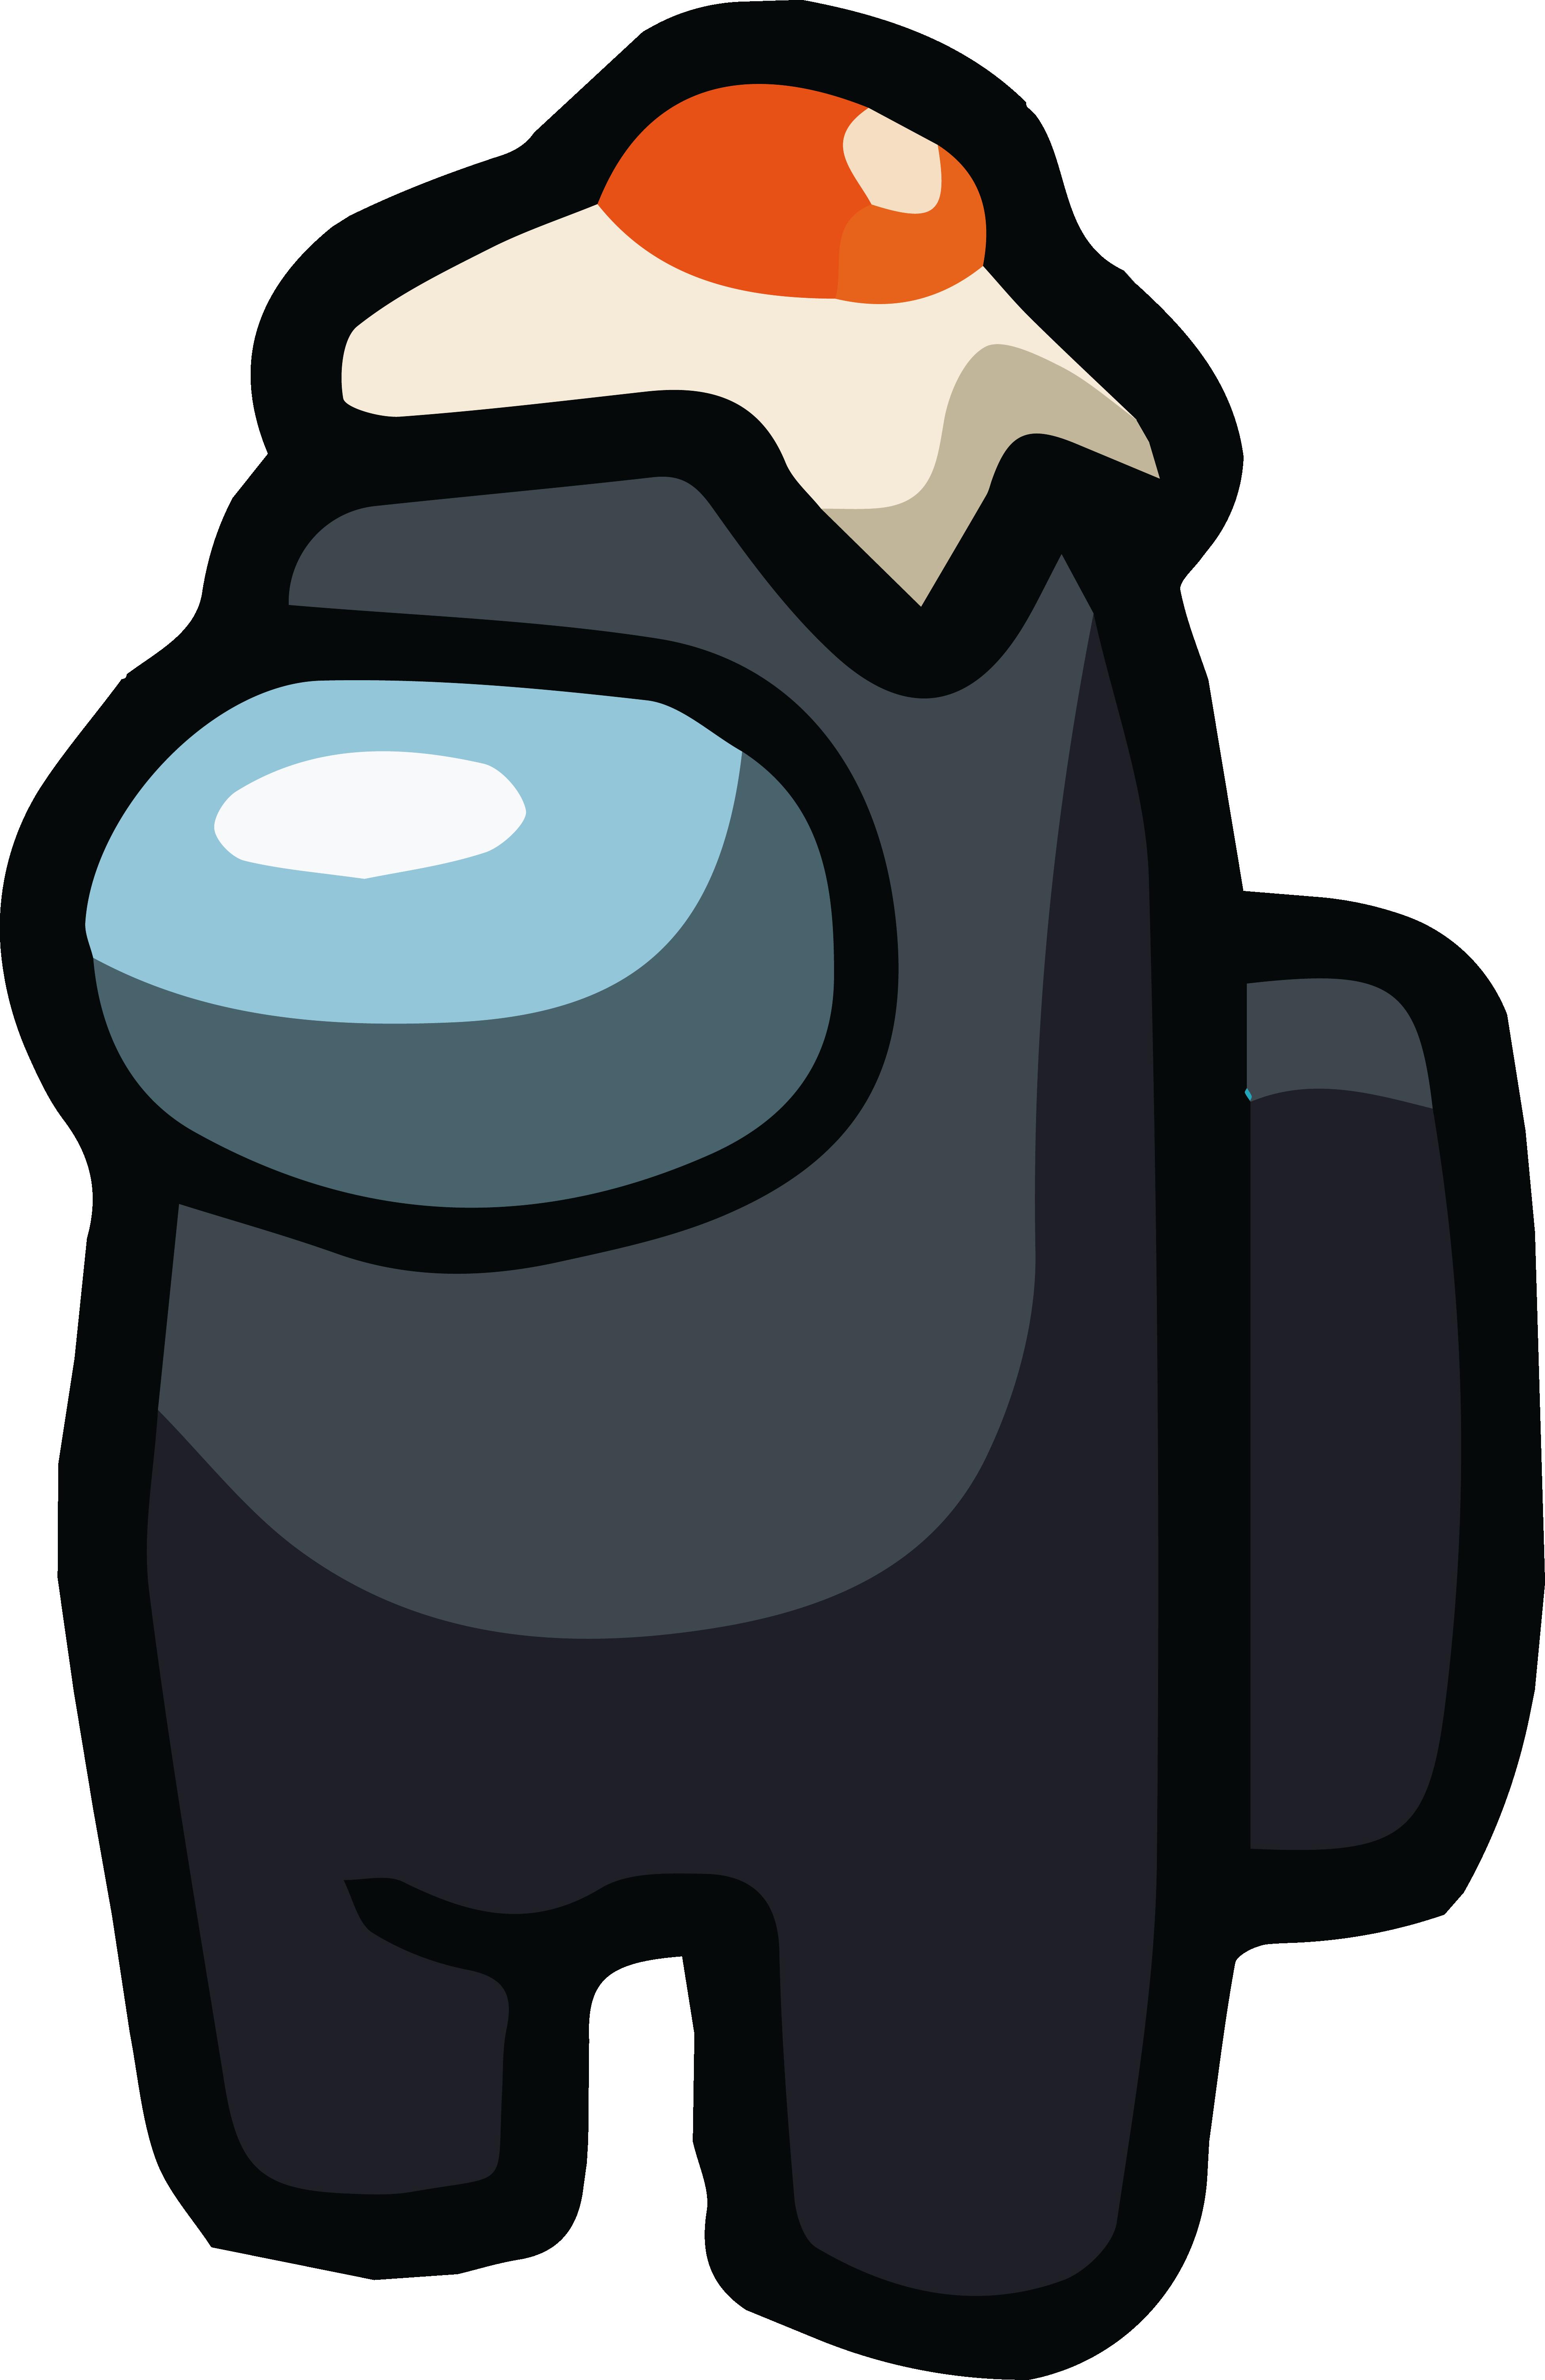 Among Us Character Download PNG Image